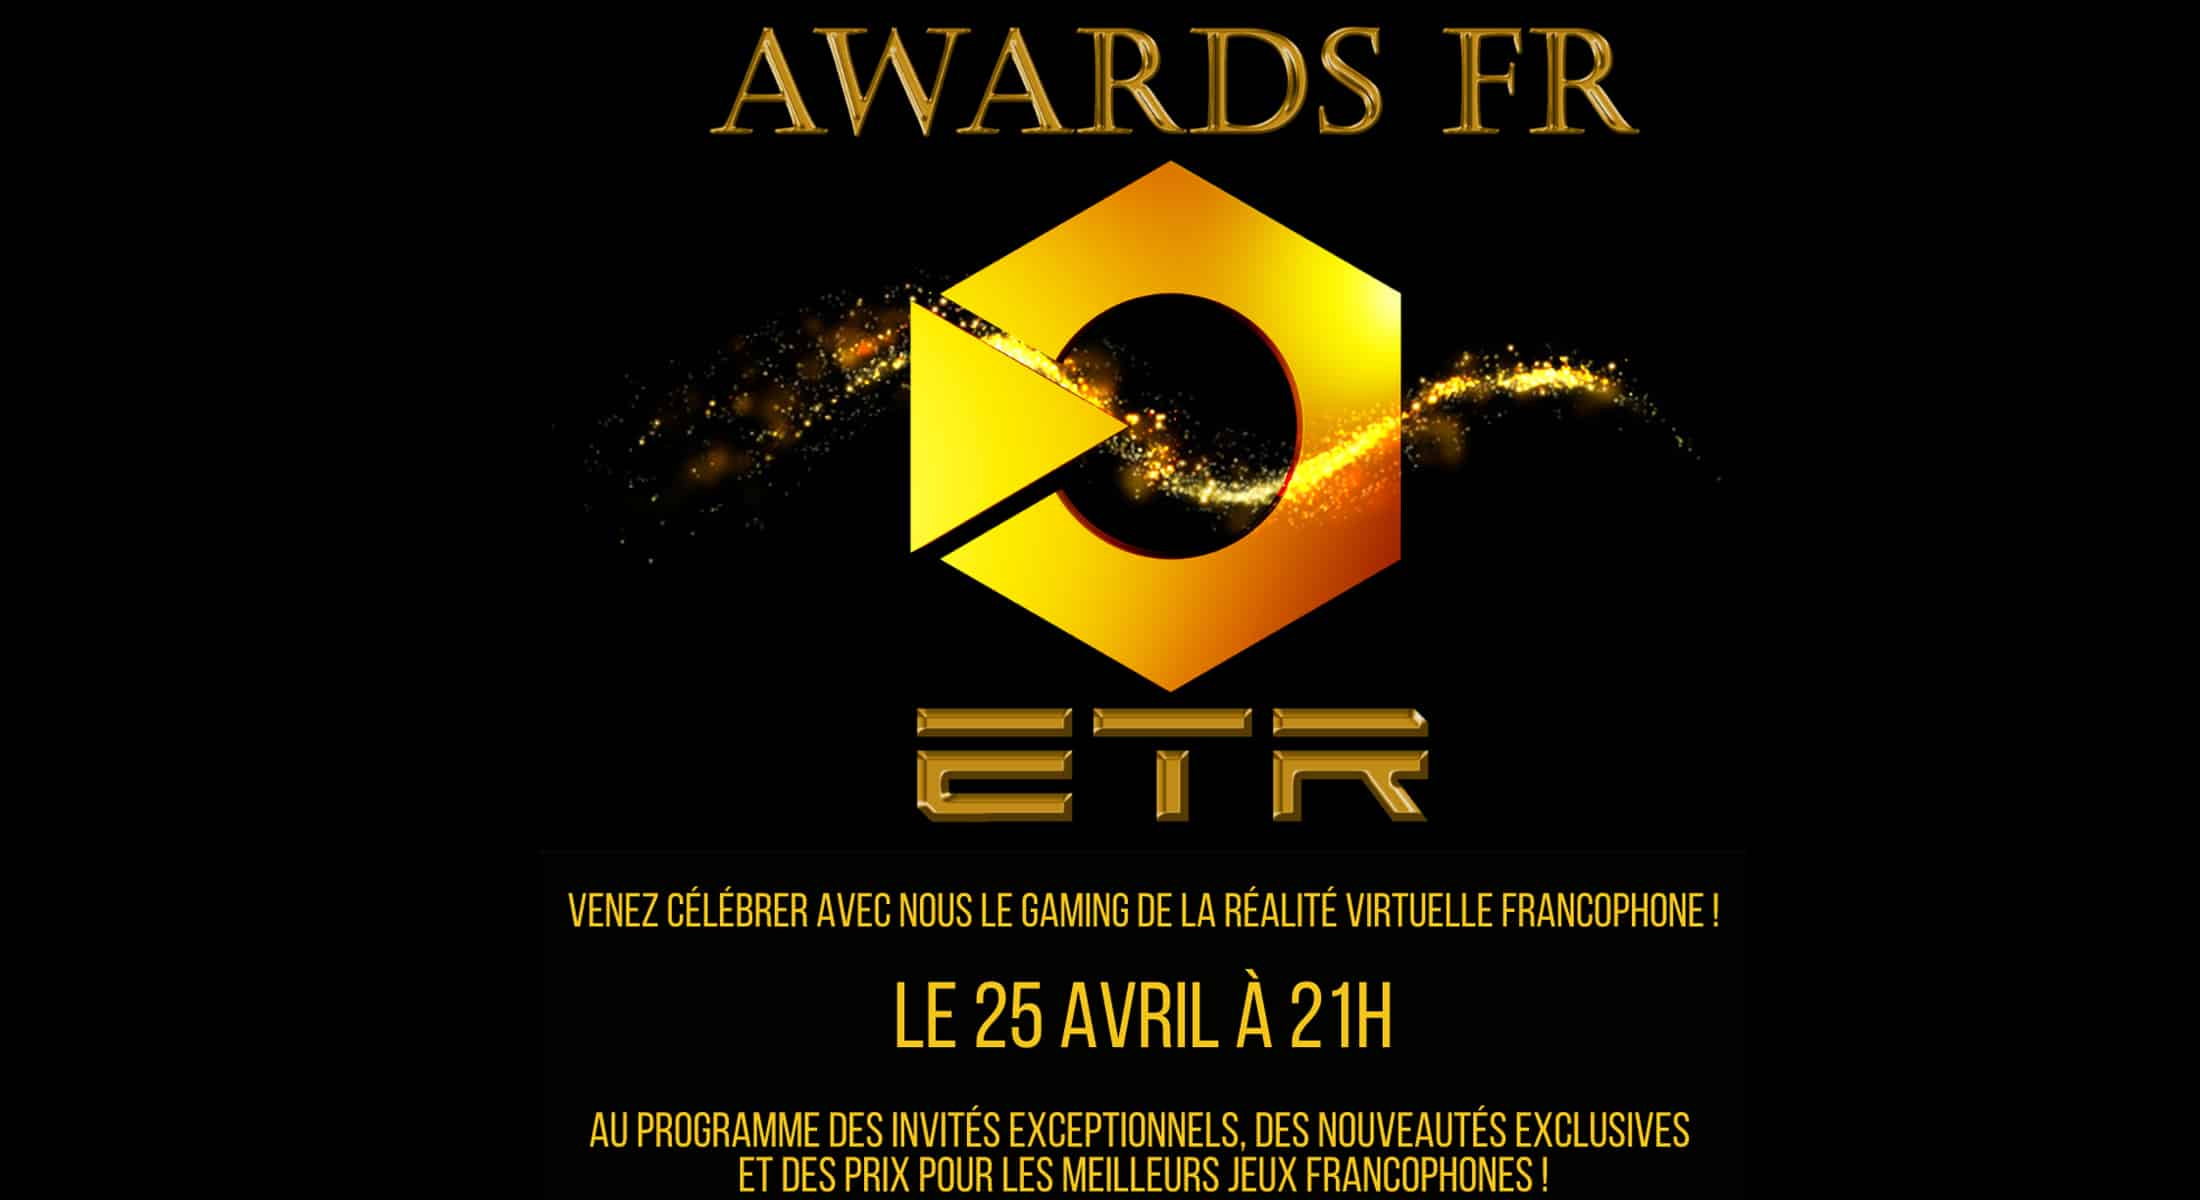 ETR AWARDS